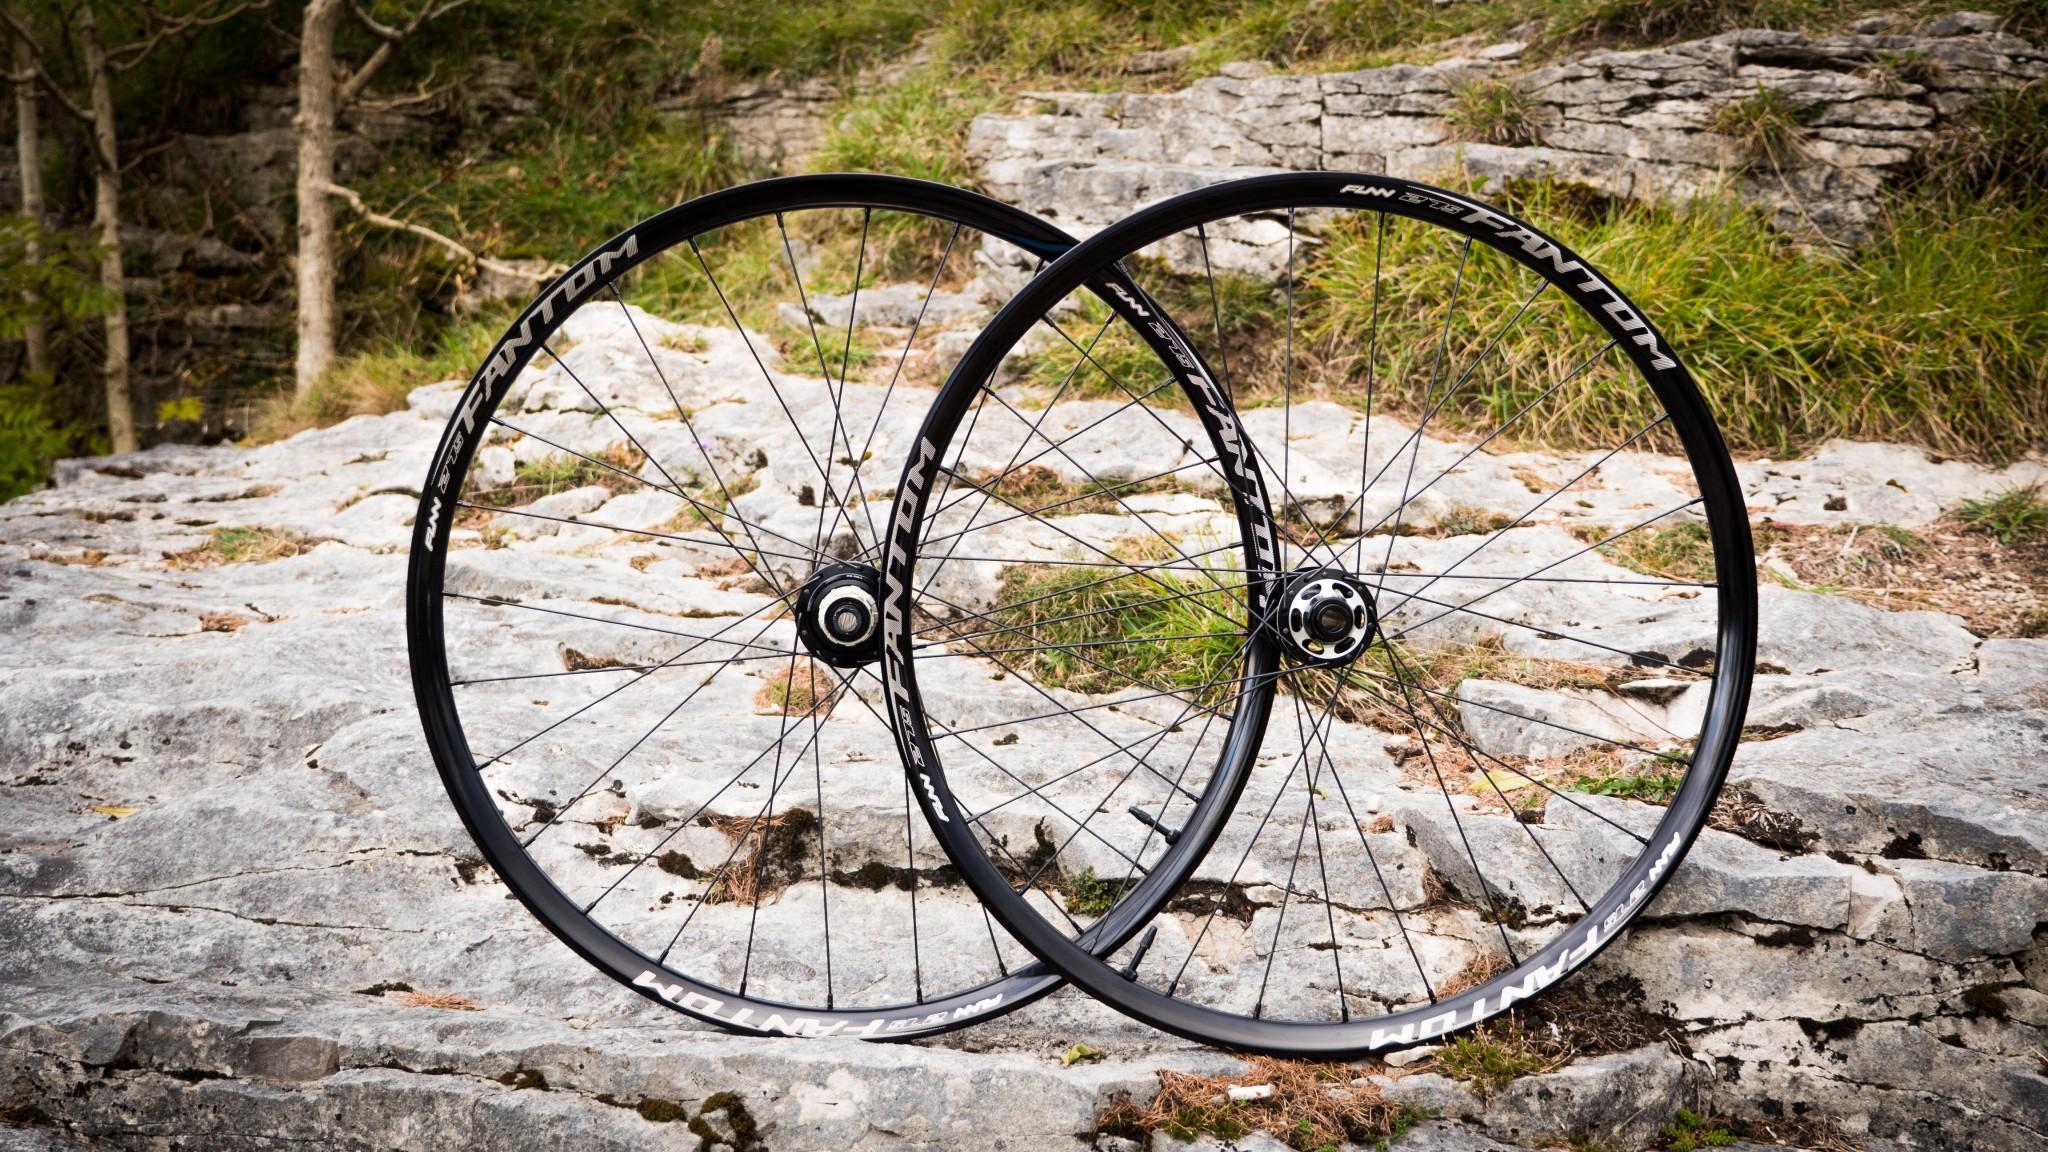 Funn Fantom 2016 Mountain Bike Reviews 187 Wheels Imb